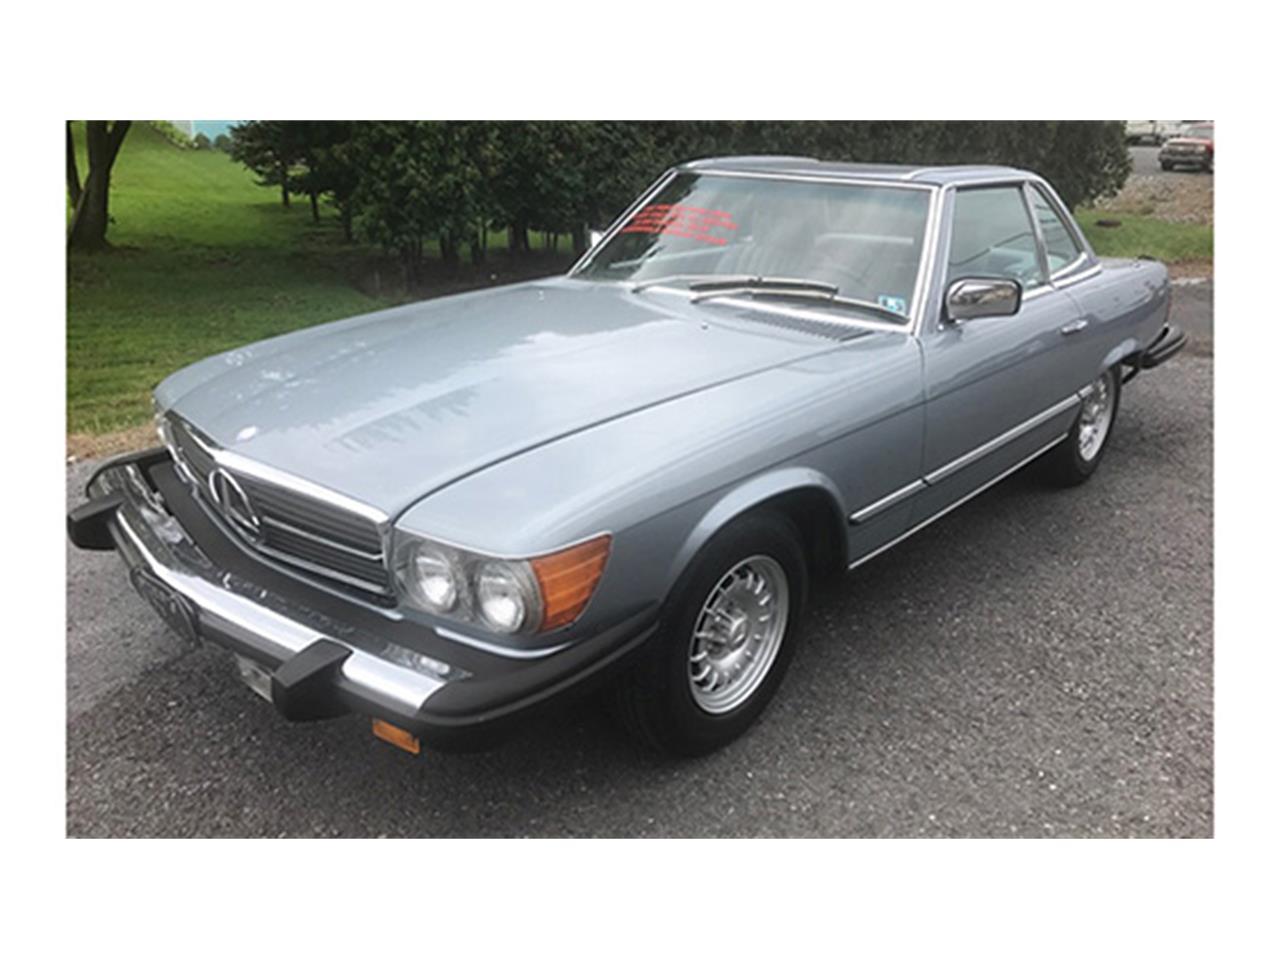 1982 Mercedes-Benz 300SL for Sale | ClassicCars.com | CC-1012108